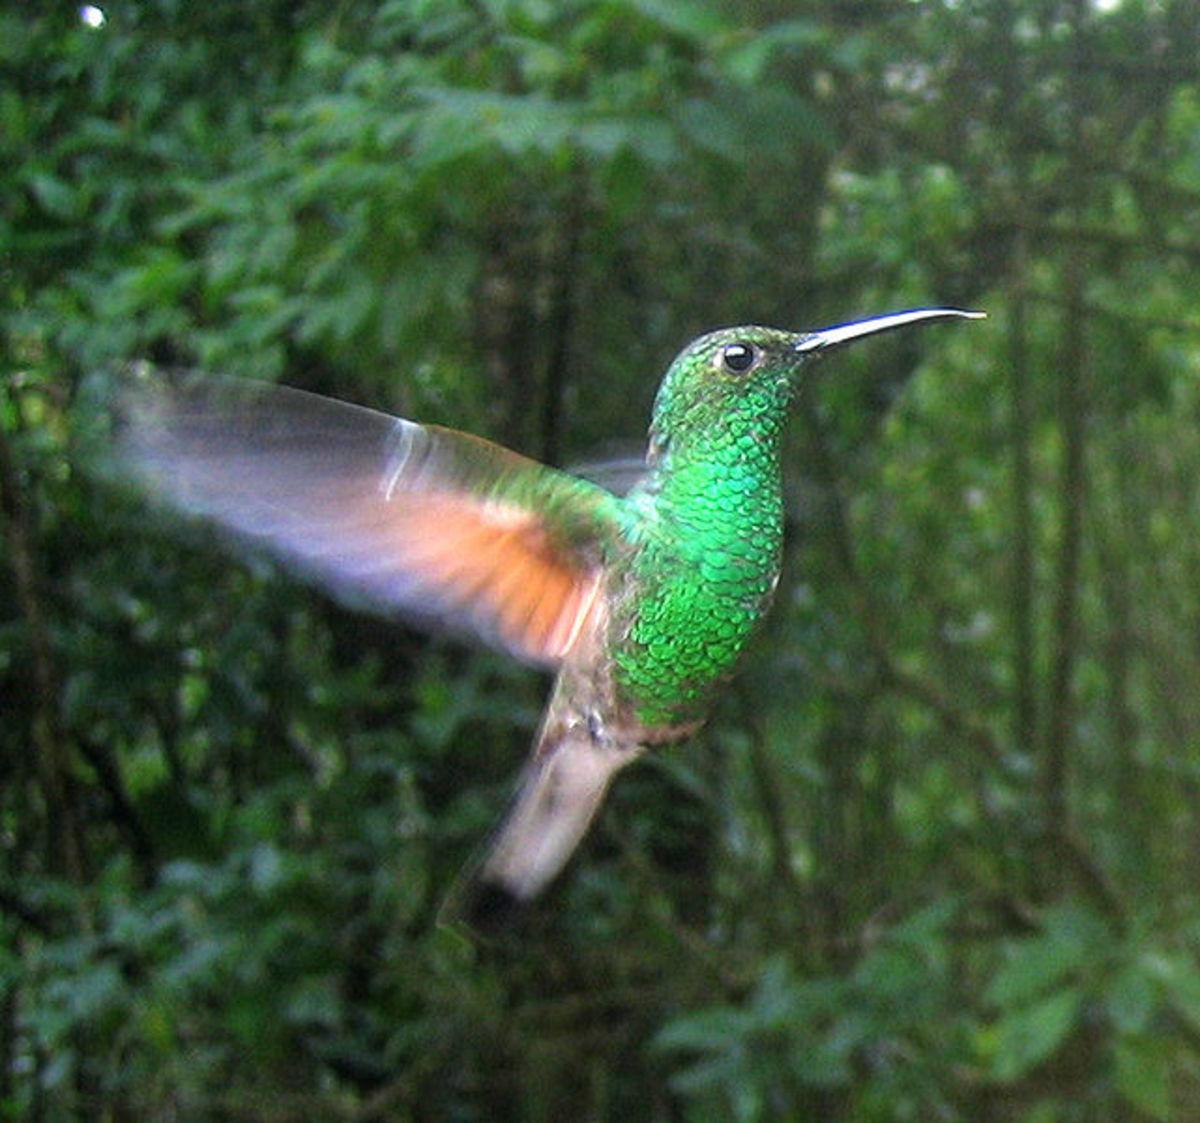 Different species of hummingbirds: Buff-bellied Hummingbird